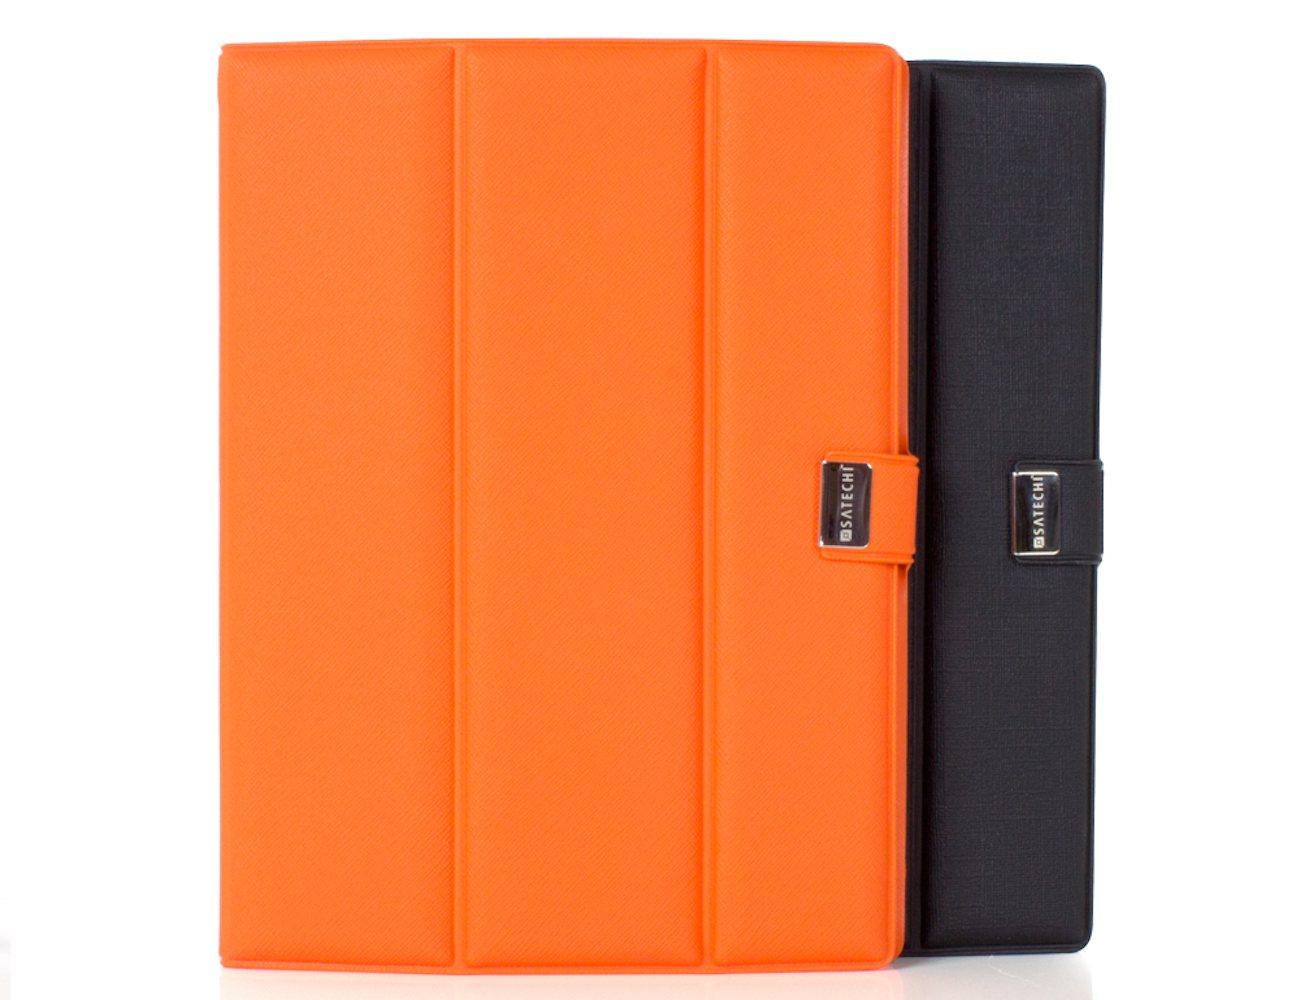 Satechi Waterproof IPX8 iPad Mini Case